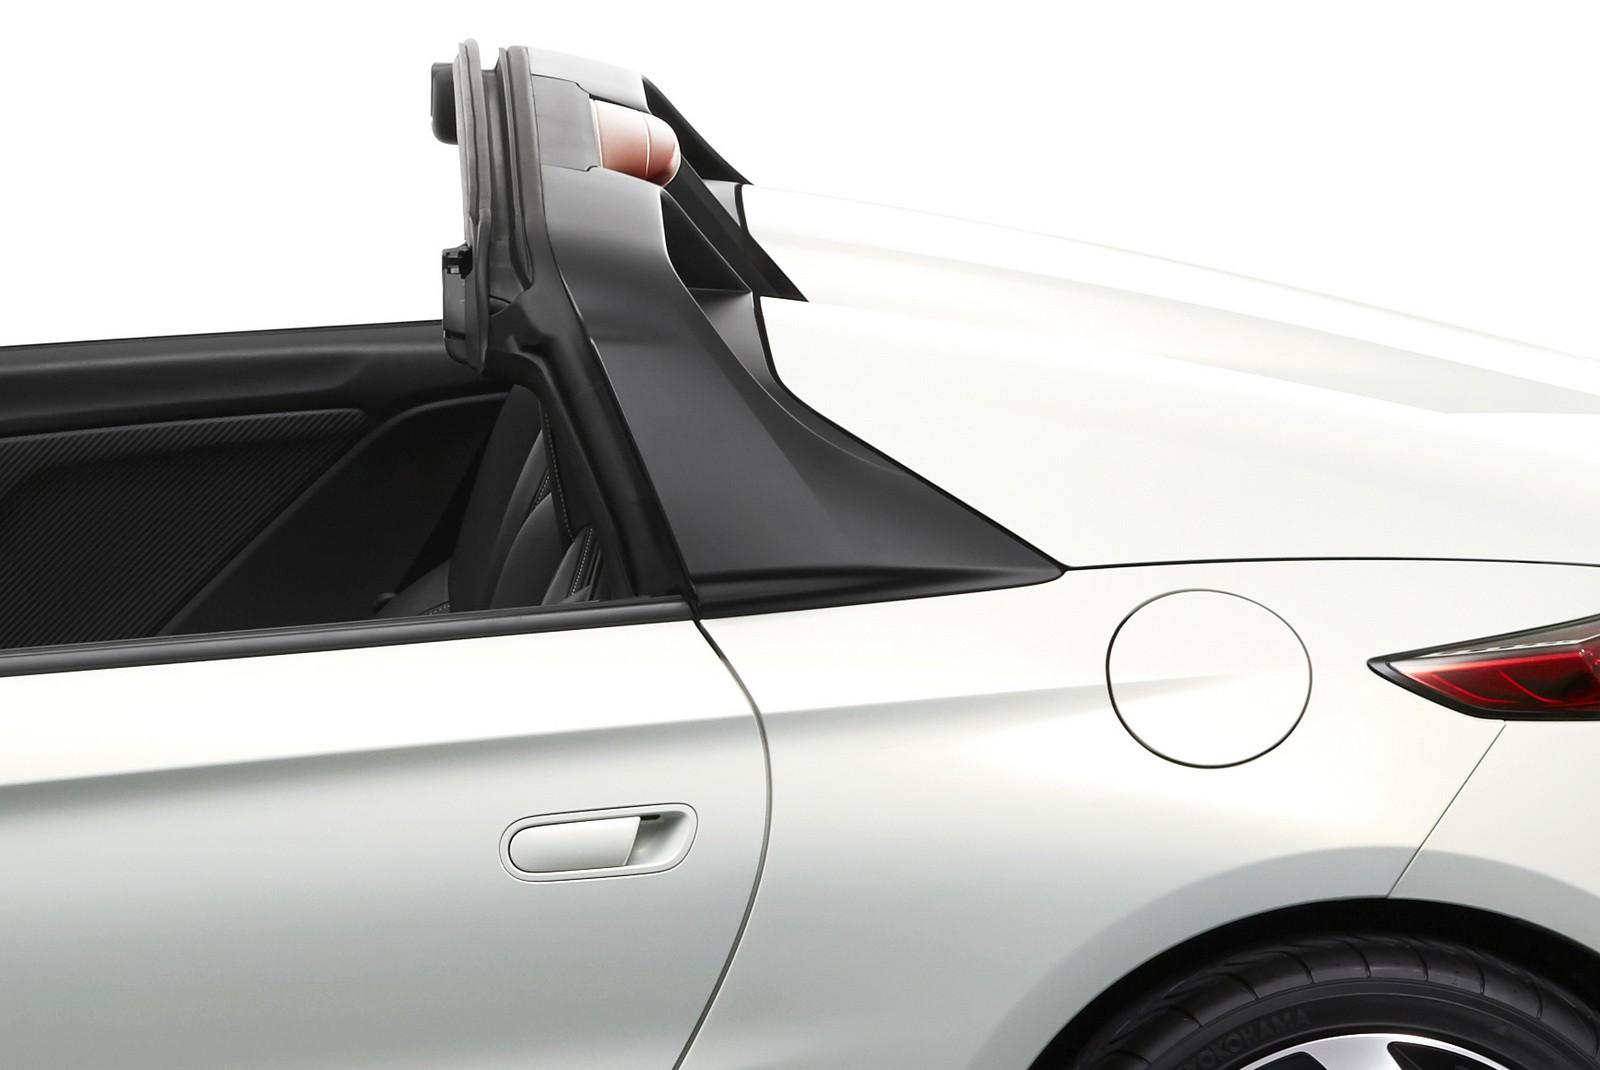 New Honda S660 Photo Gallery Reveals Color Options, S660 Concept Edition - autoevolution